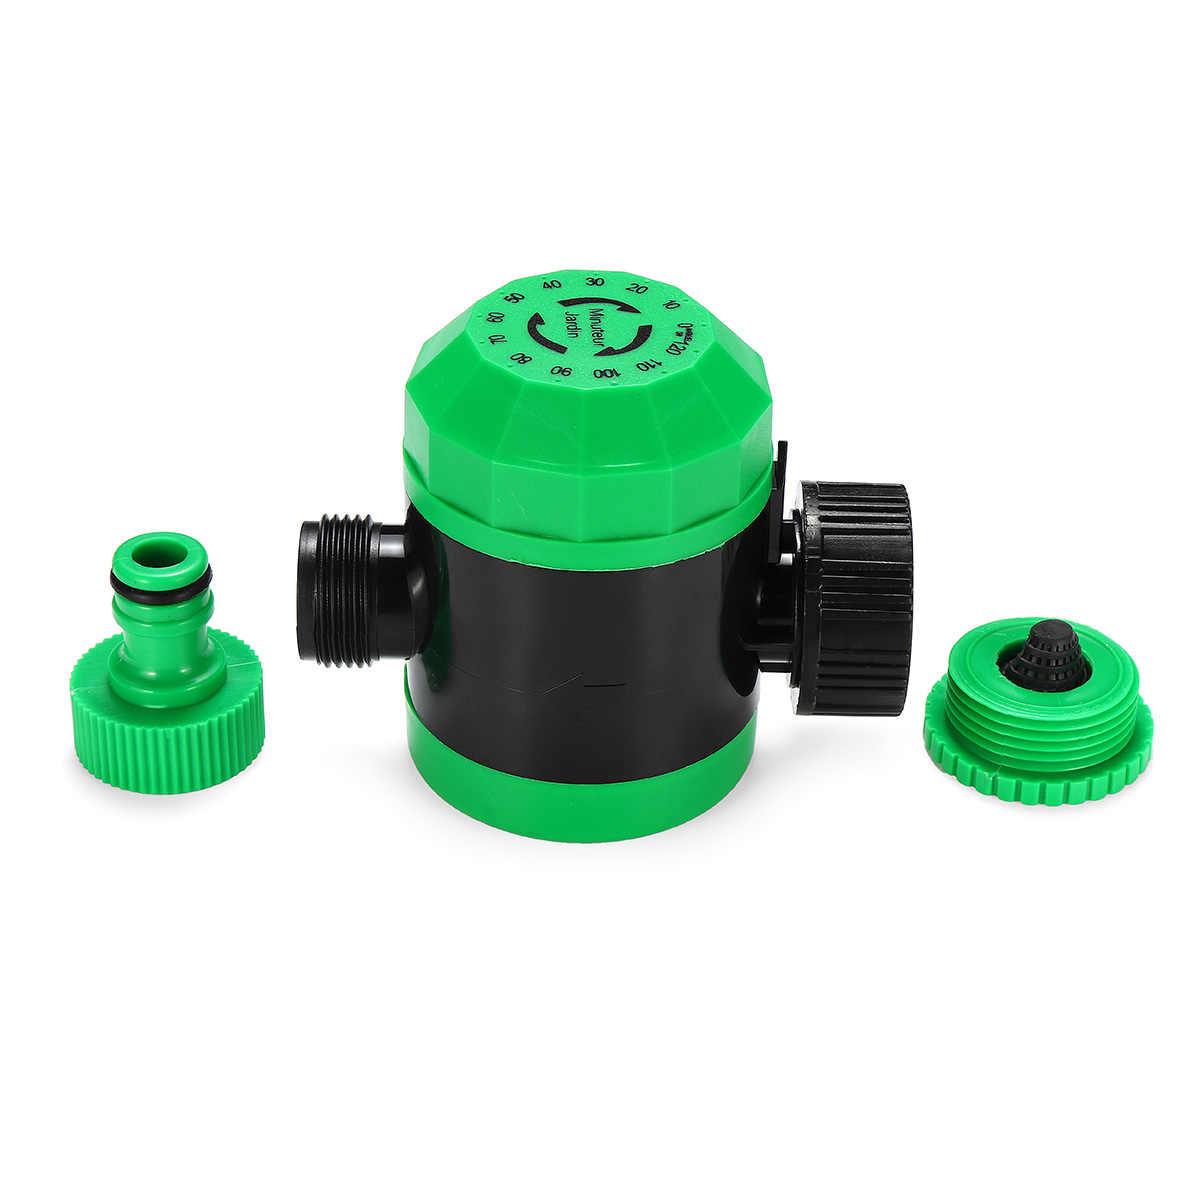 Otomatis Elektronik Rumah Ball Valves Air Timer Taman Penyiraman Timer Irigasi Controller Sistem Selang Taman Kit